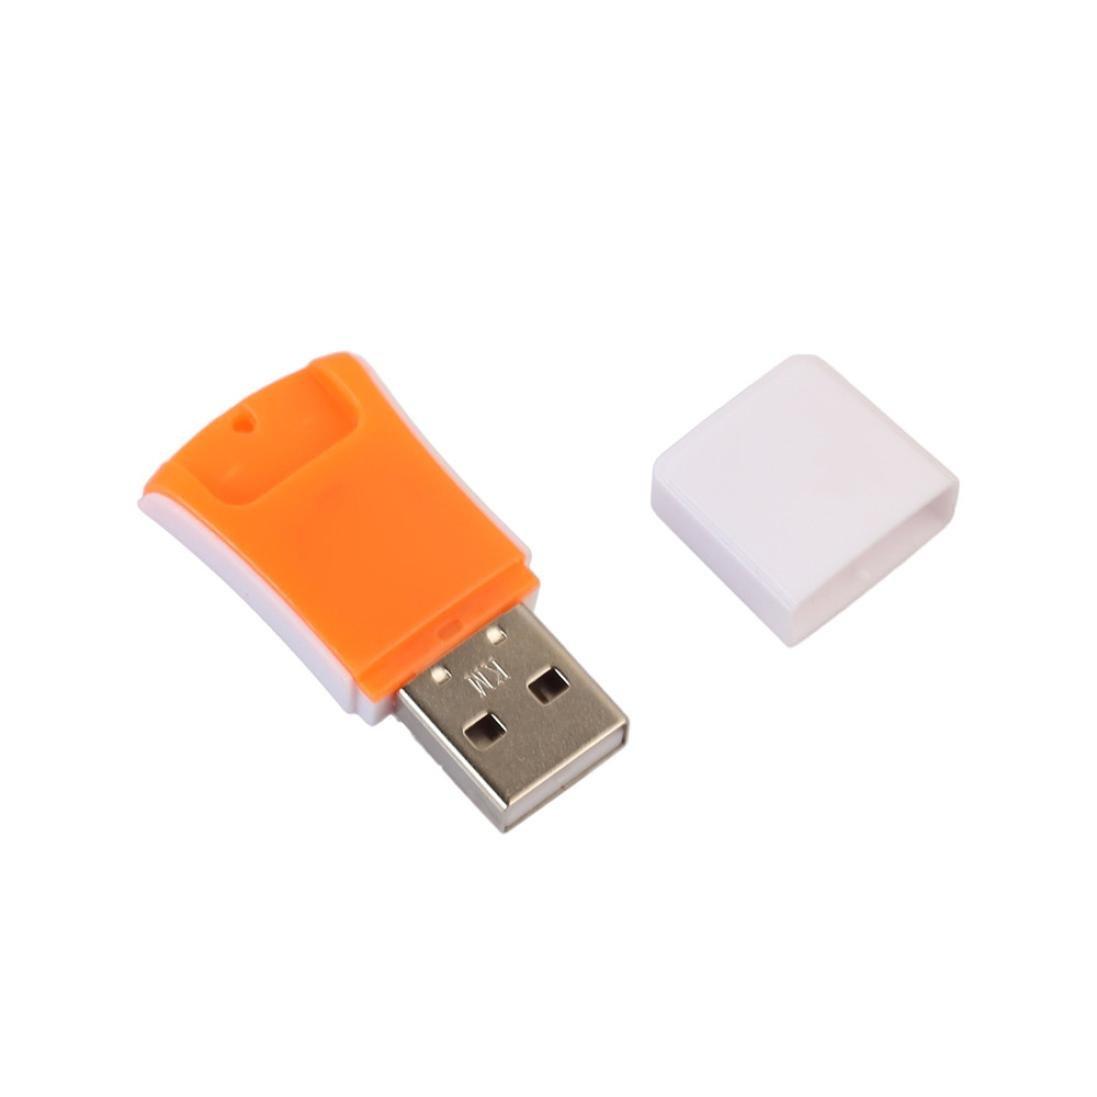 Dreamyth New Micro USB 2.0 Mini Card Reader Reader SD TF T-Flash High Speed Portable (yellow)